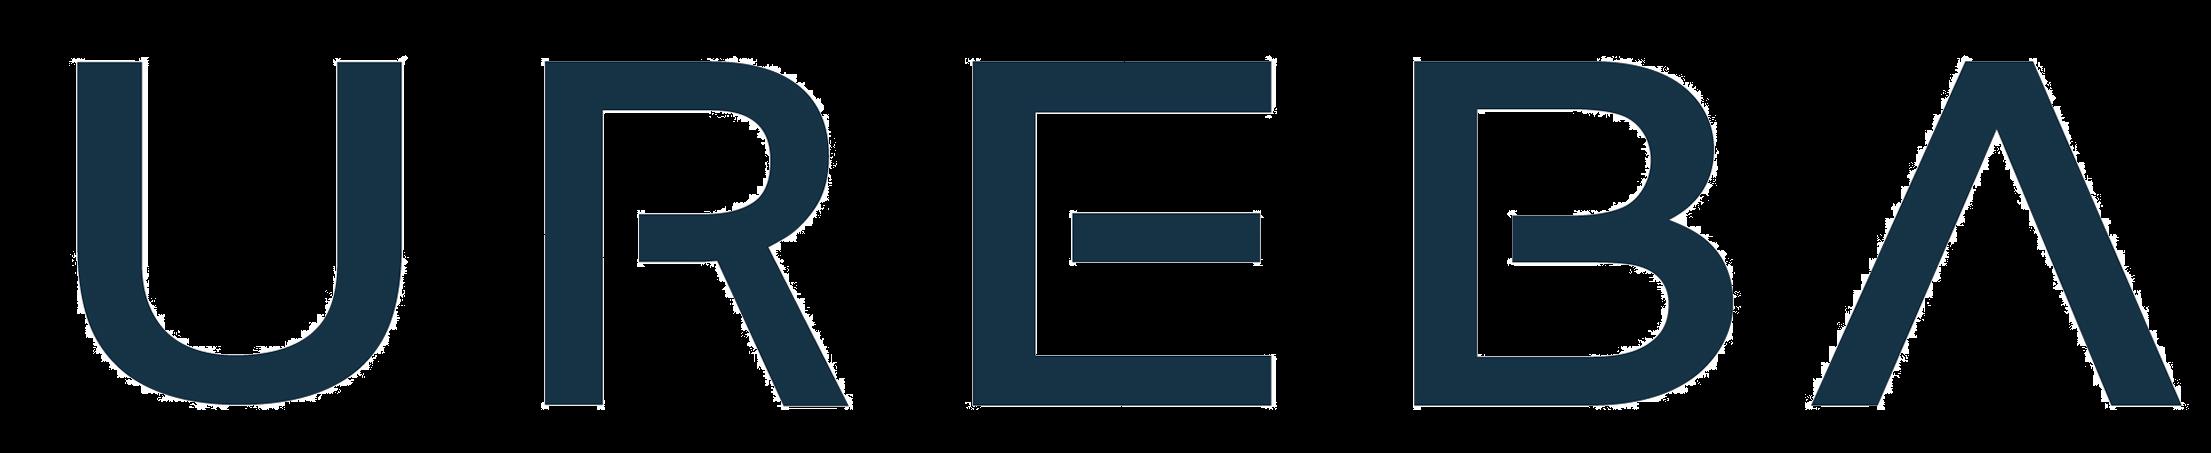 Logo4 1